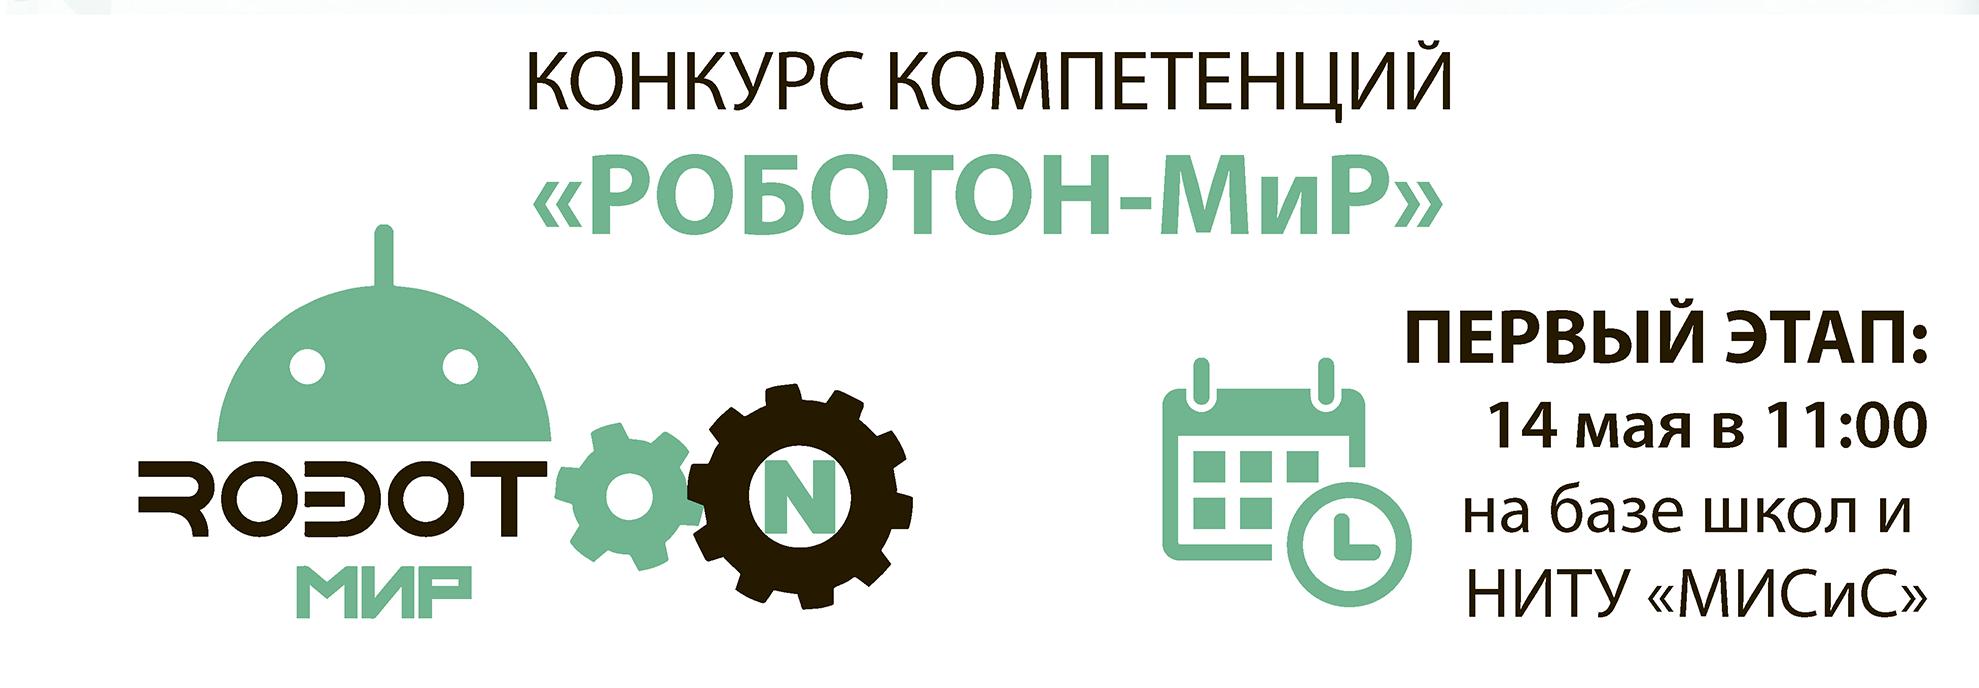 РОБОТОН-МиР 2017